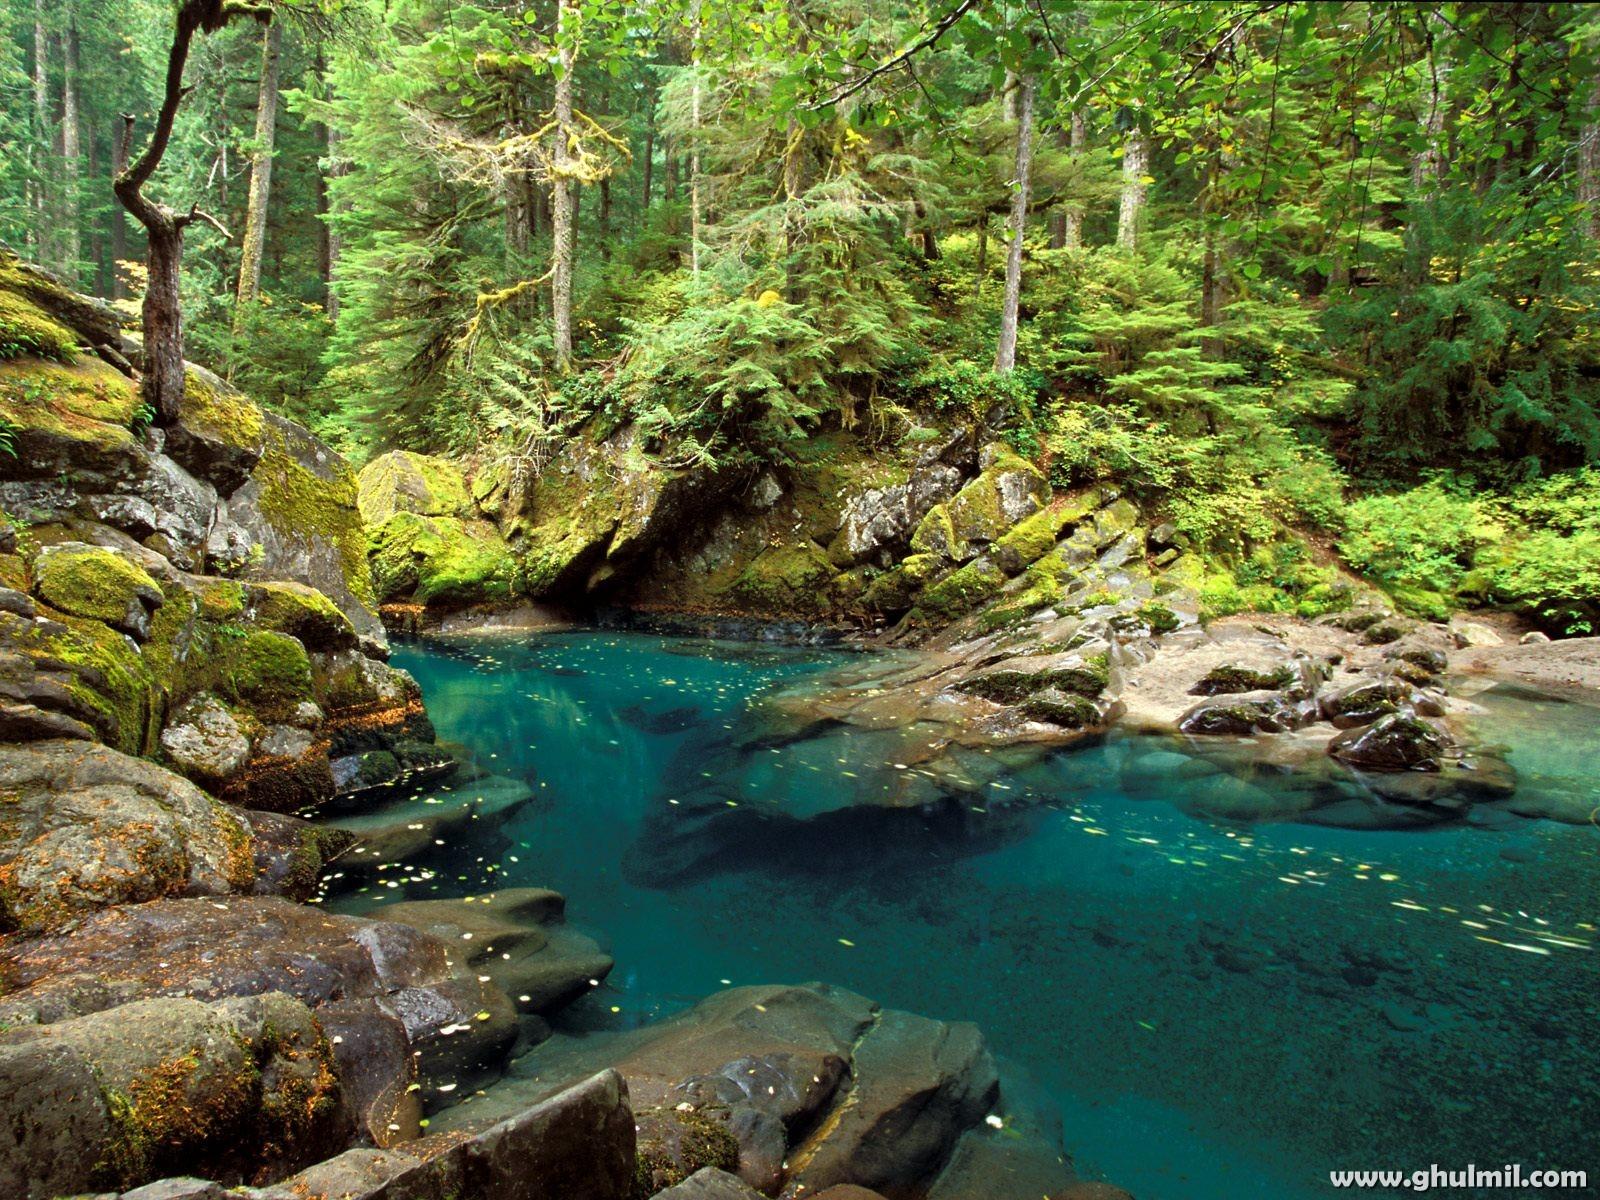 http://3.bp.blogspot.com/-3Ij0NWrktZA/TddjIJCwcsI/AAAAAAAAAFY/hLf29B7QXuE/s1600/7tural-scenery-or-blue-lake-wallpaper.jpg